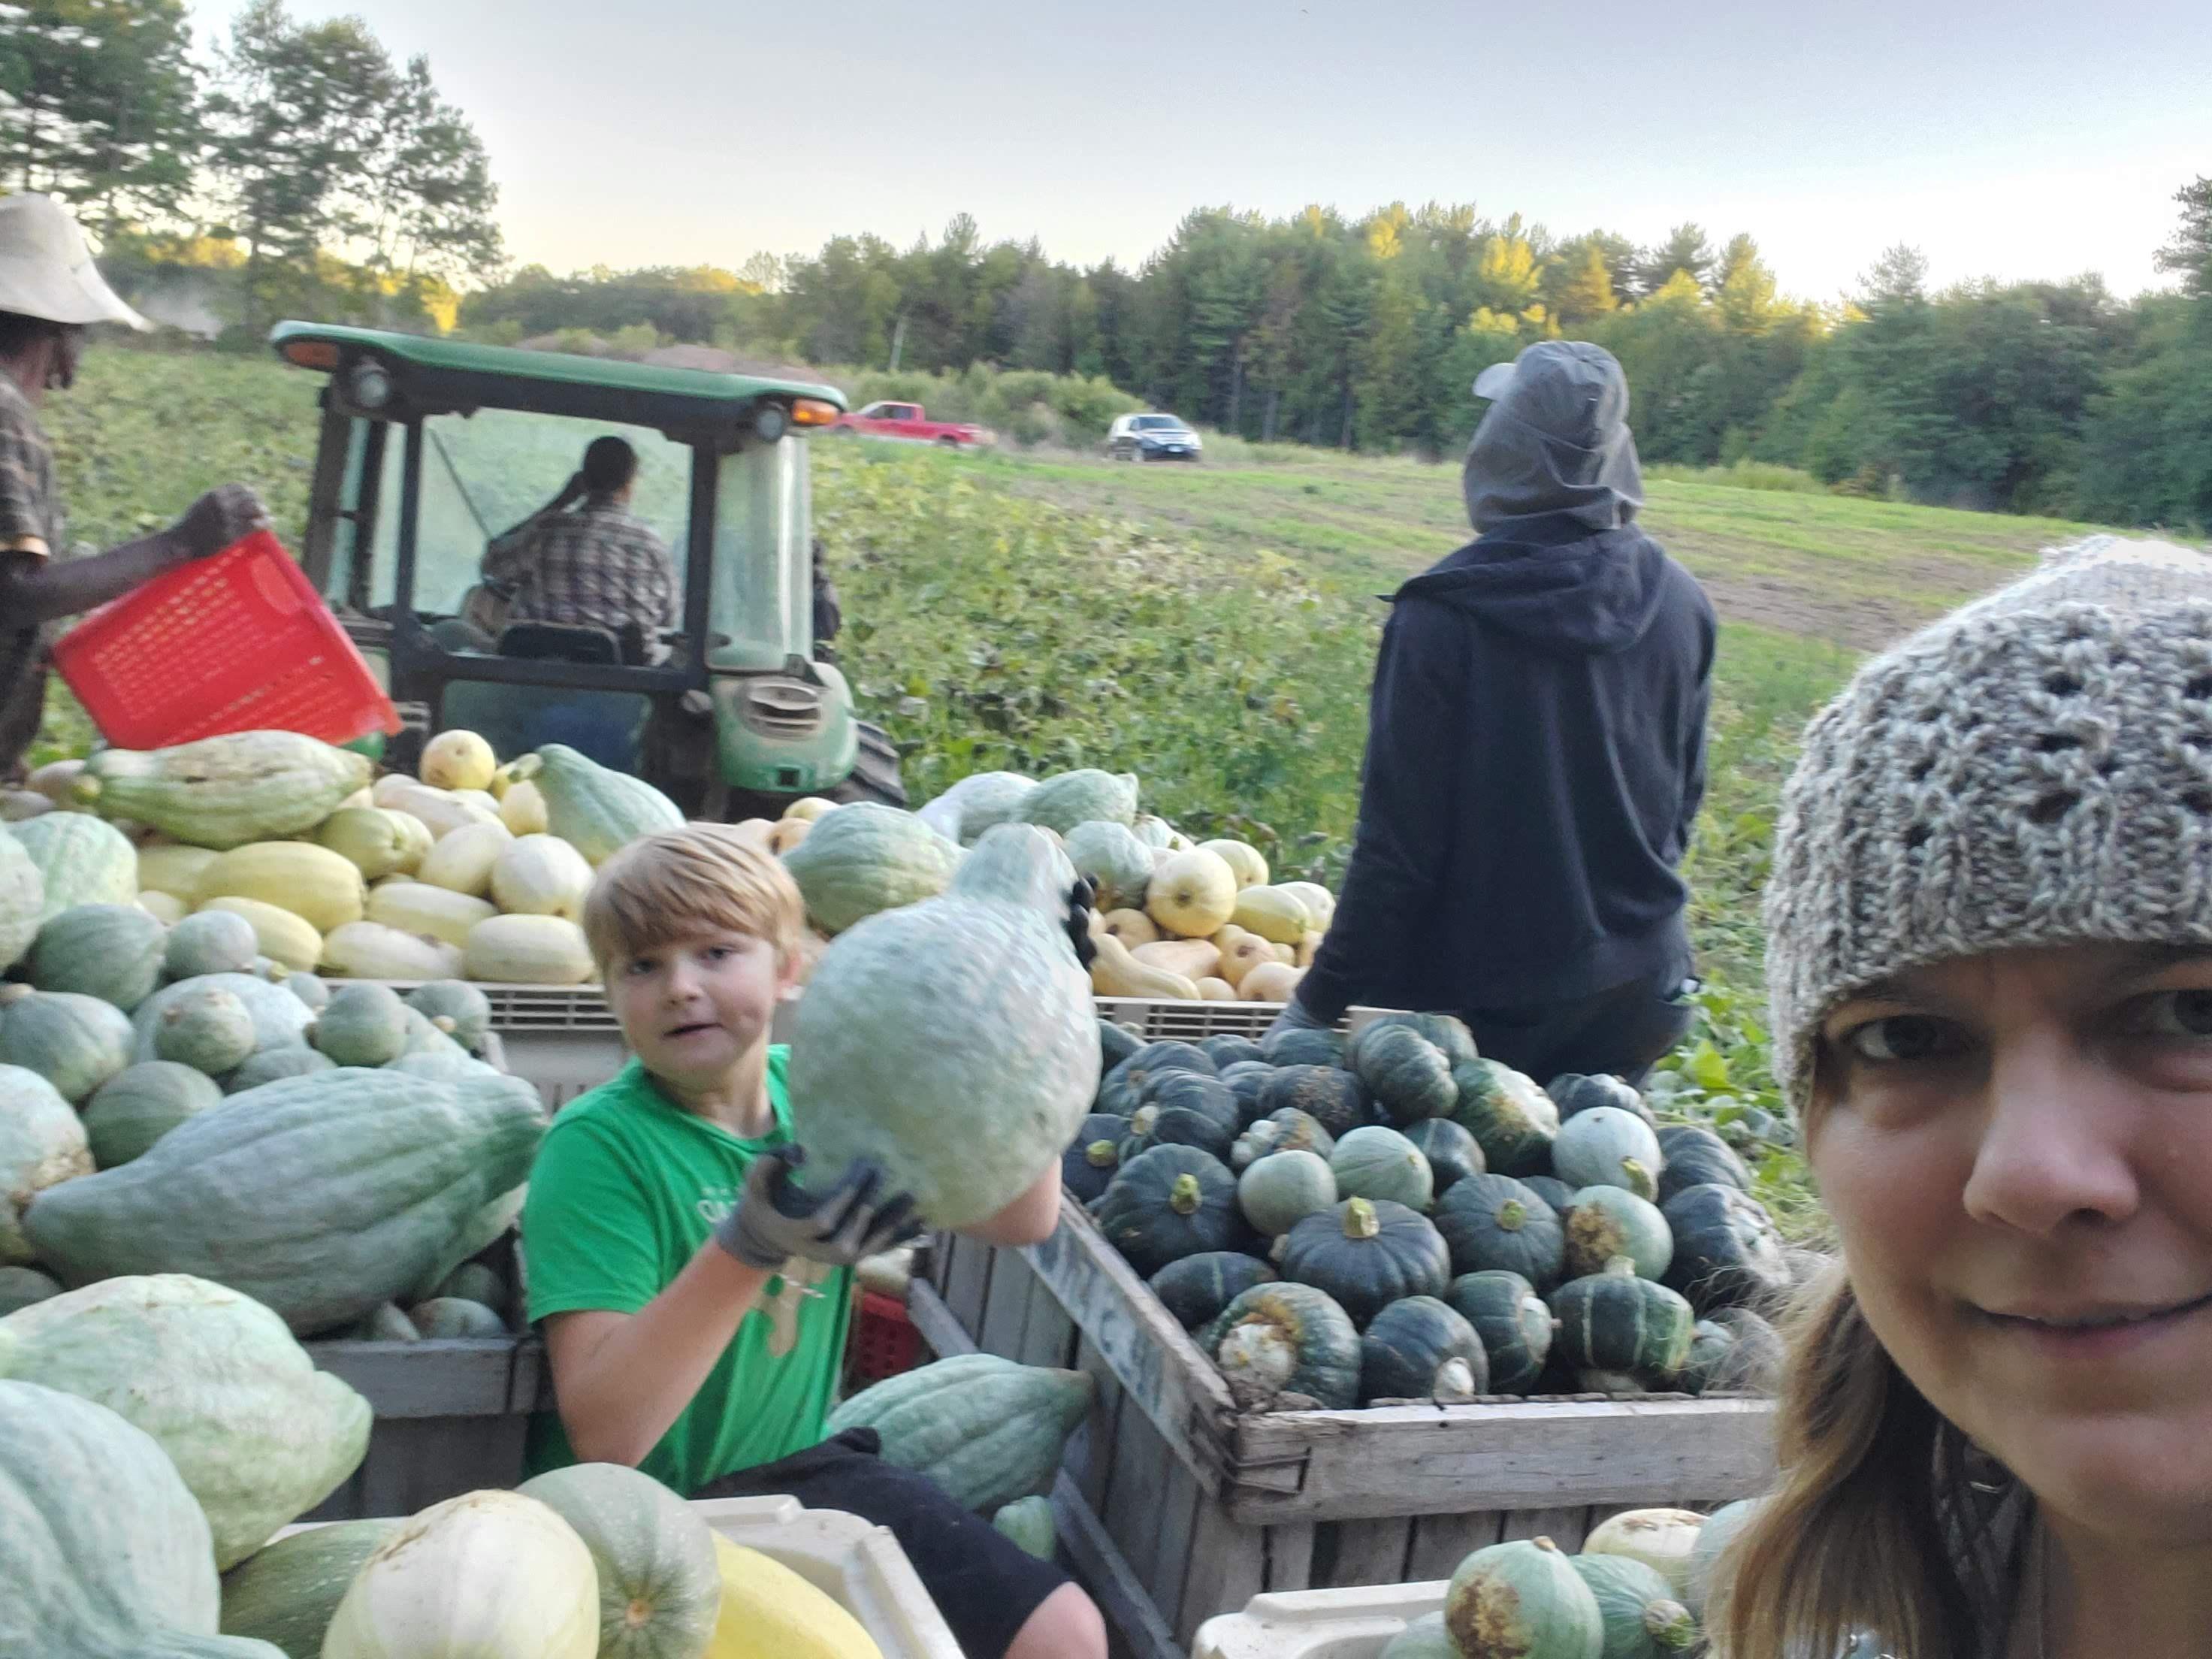 Previous Happening: Oxen Hill Farm Summer 2020 CSA Season Week 15! (week of September 28)